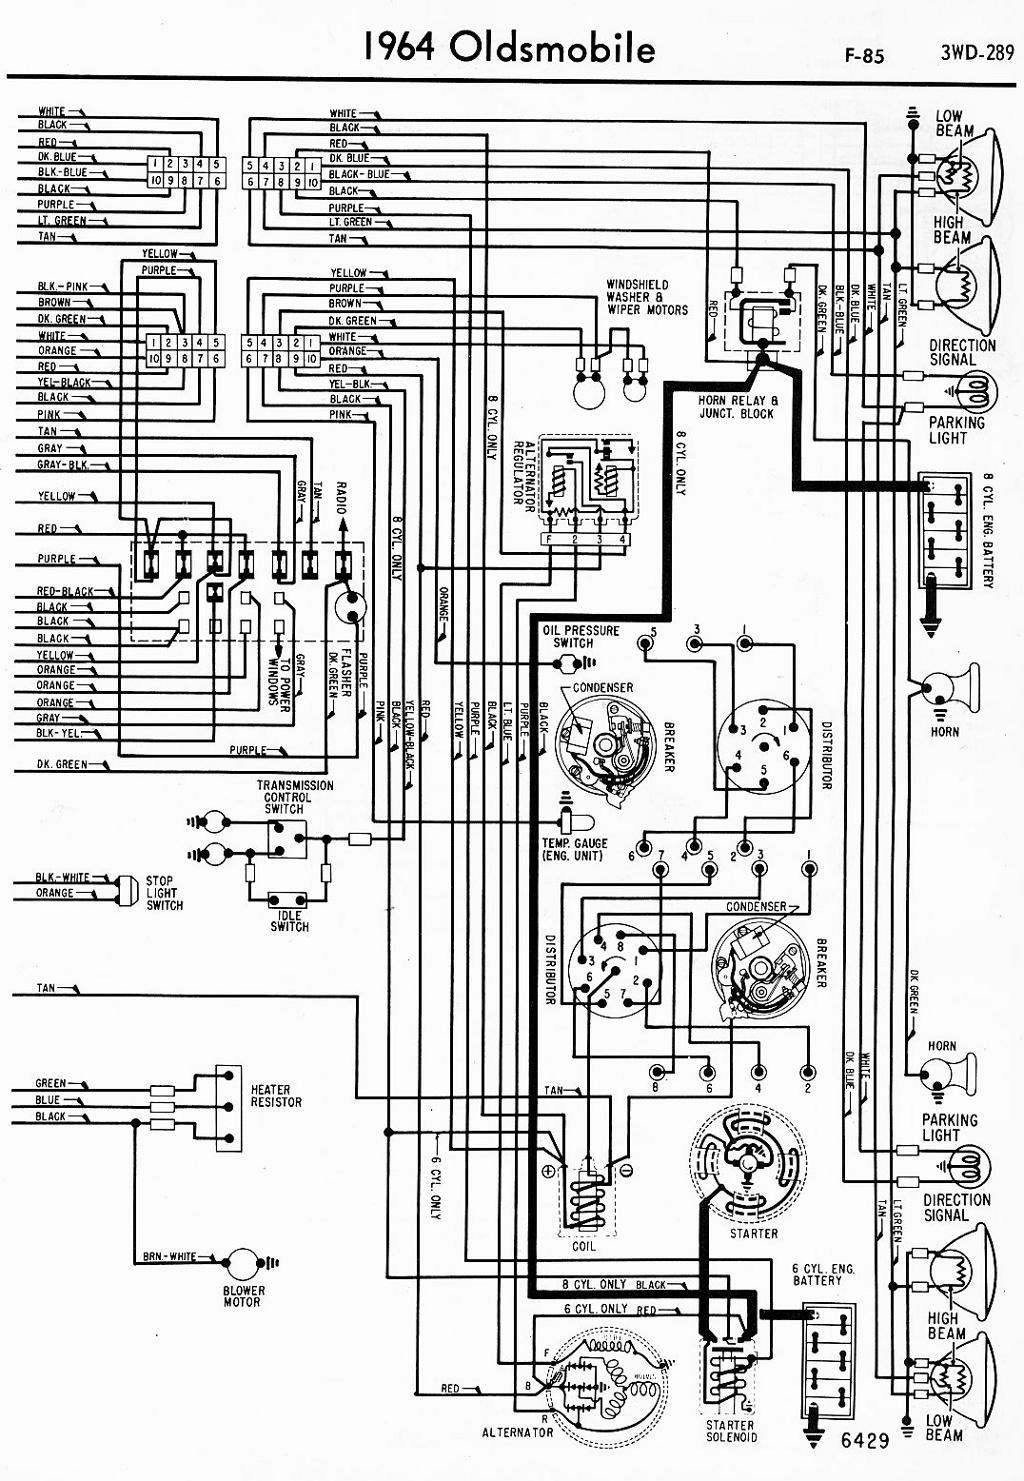 1967 oldsmobile toronado wiring diagram wiring library rh 50 skriptoase de 1968 oldsmobile cutlass wiring  [ 1024 x 1481 Pixel ]